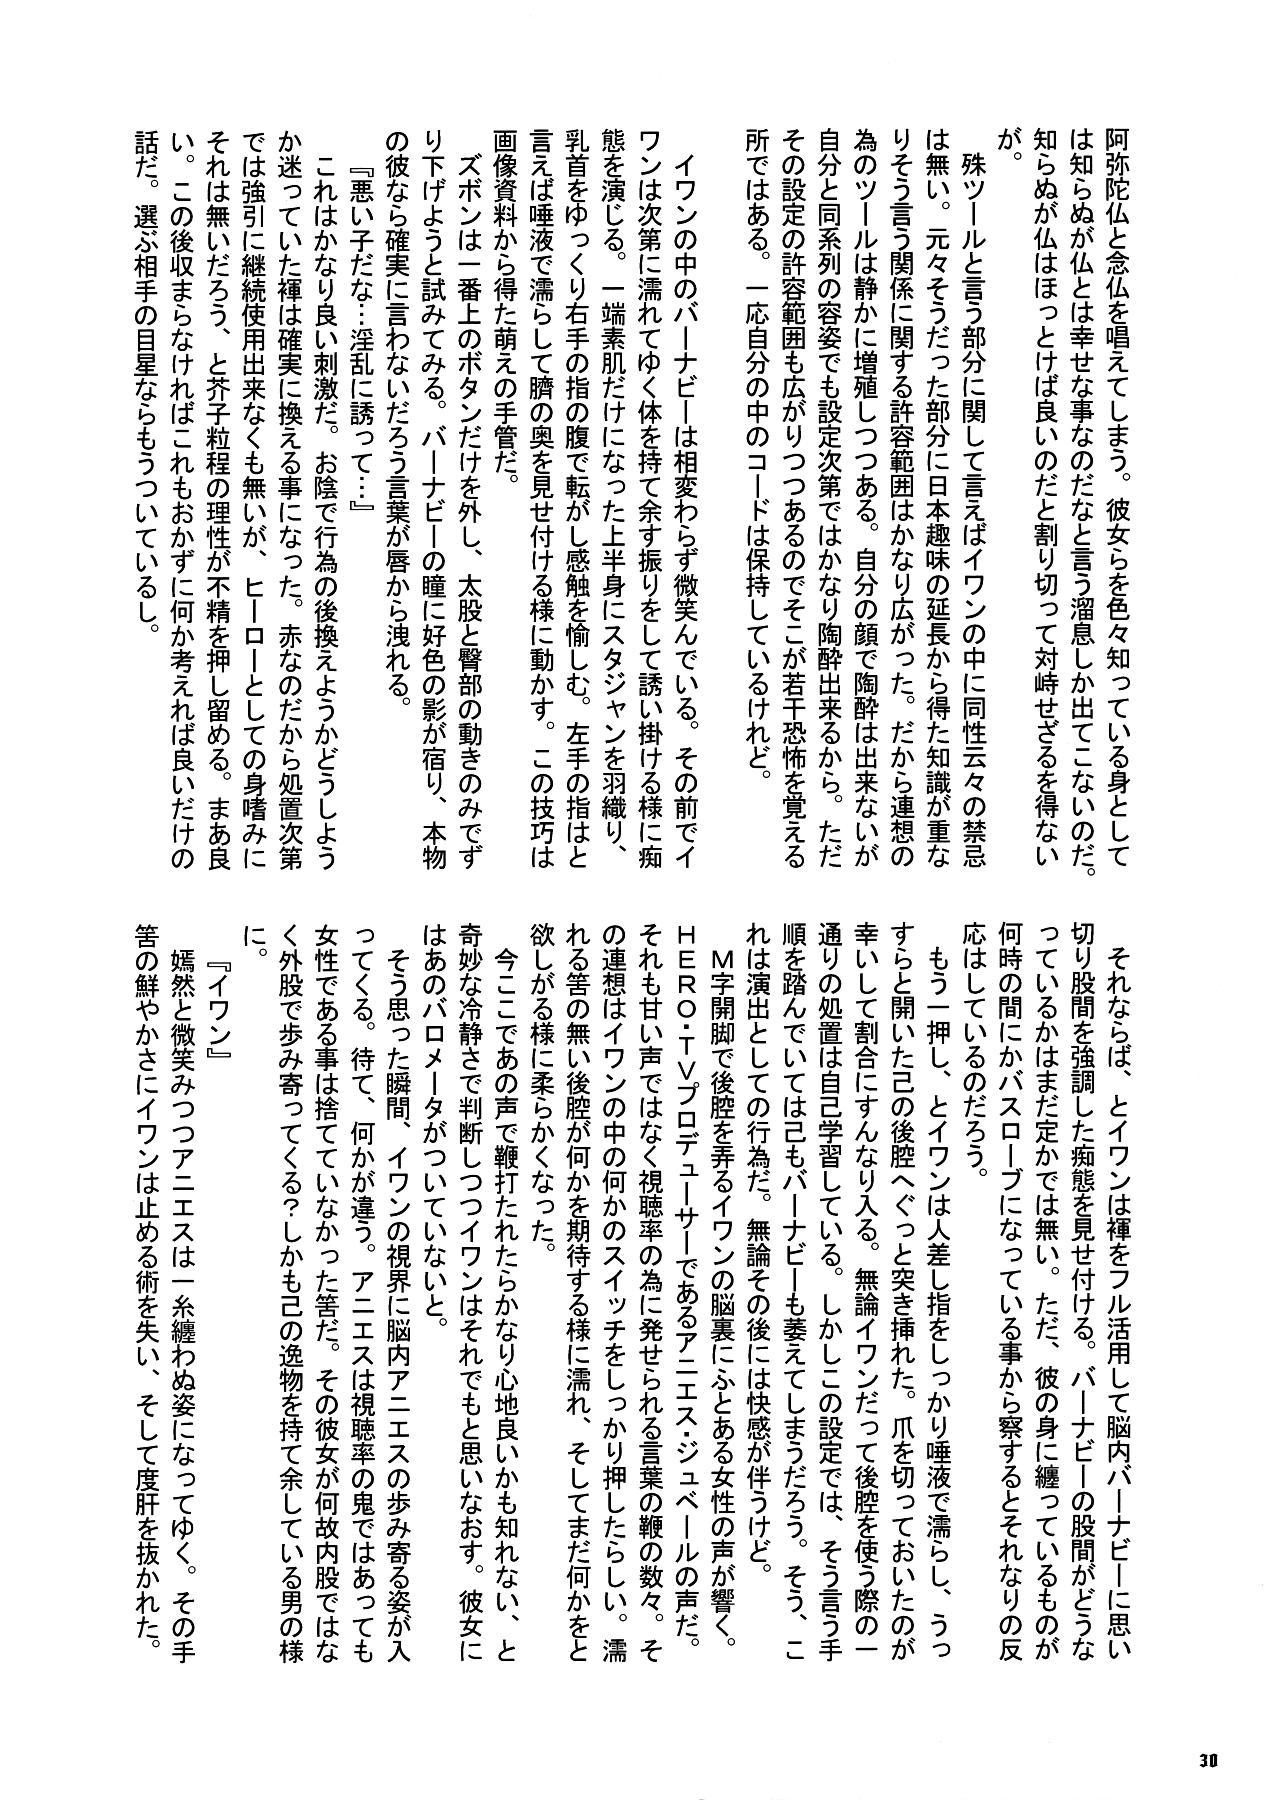 [Esecool (Boss Chin)] Agnes Nee-san Maji Do-S (TIGER & BUNNY) 28